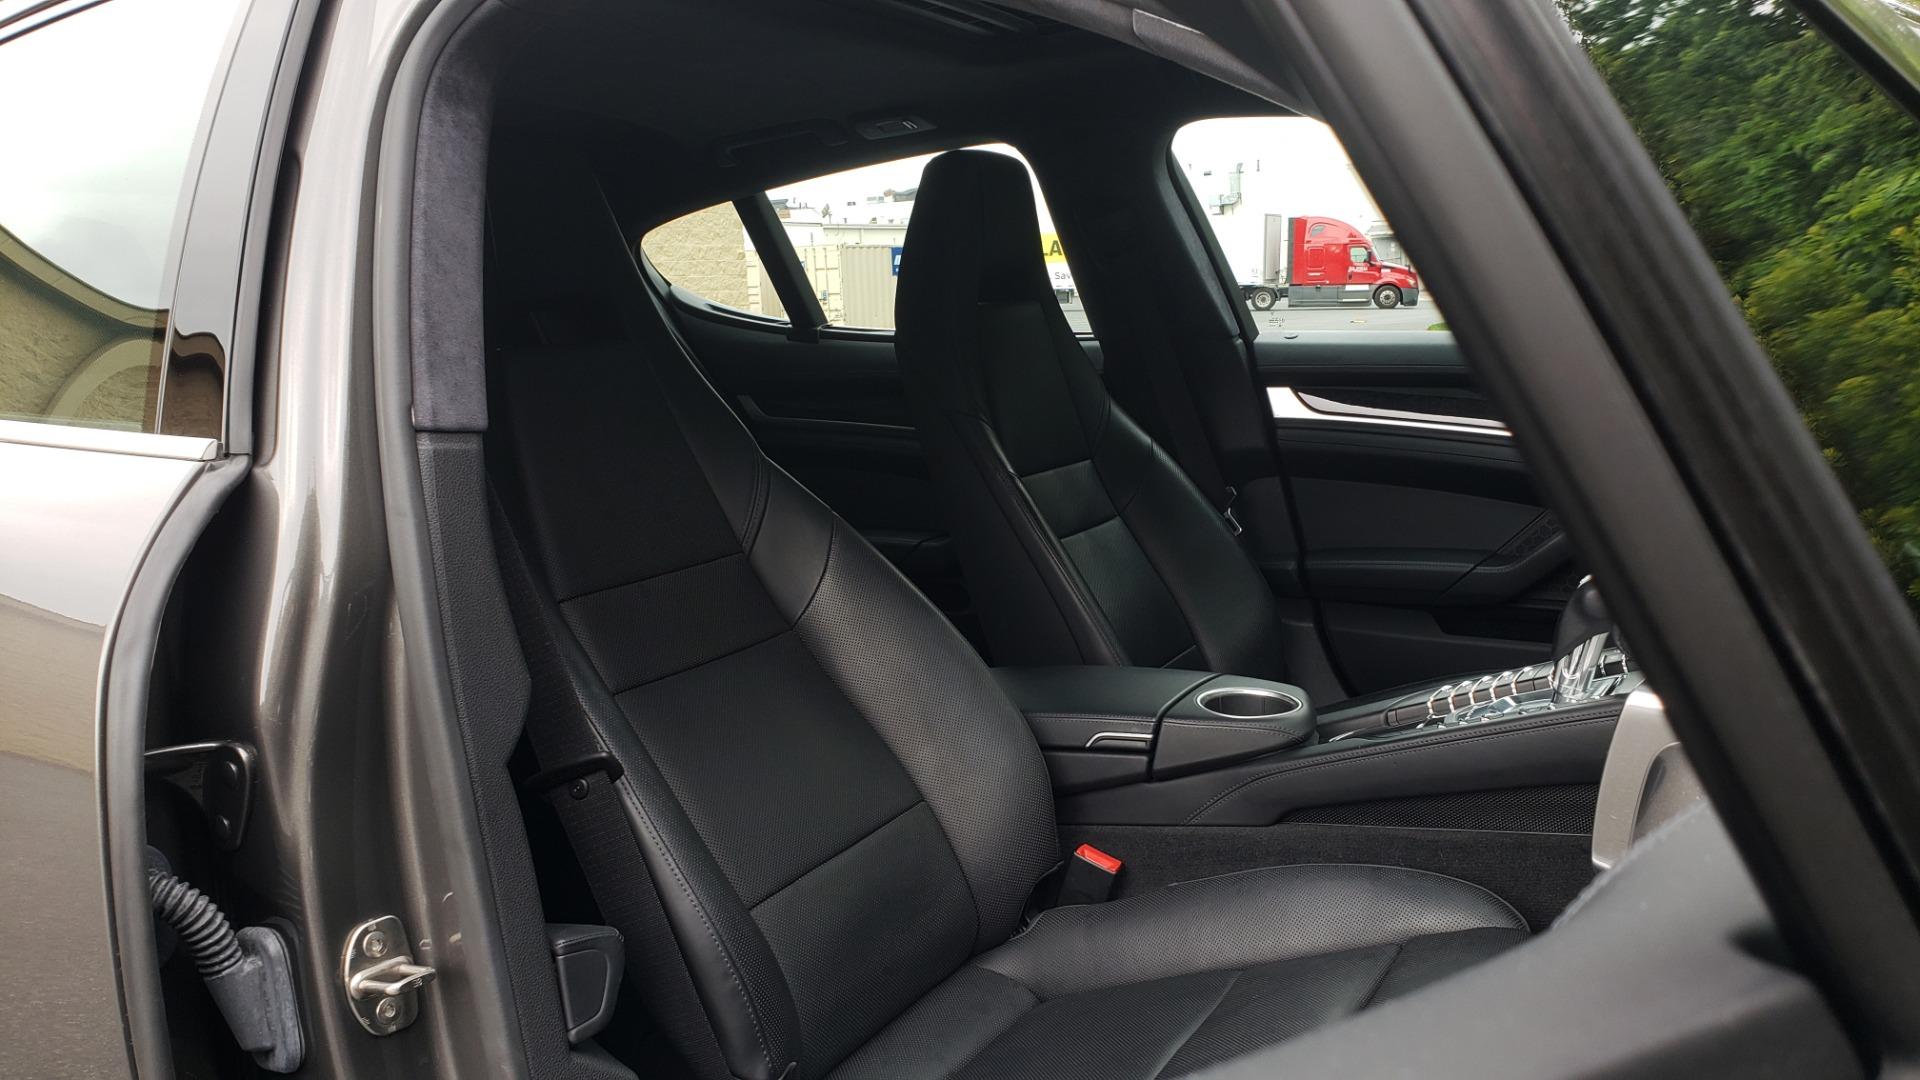 Used 2013 Porsche PANAMERA TURBO 4.8L V8 / AWD / NAV / SUNROOF / LCA / PARK ASST / BURMESTER for sale $45,995 at Formula Imports in Charlotte NC 28227 72